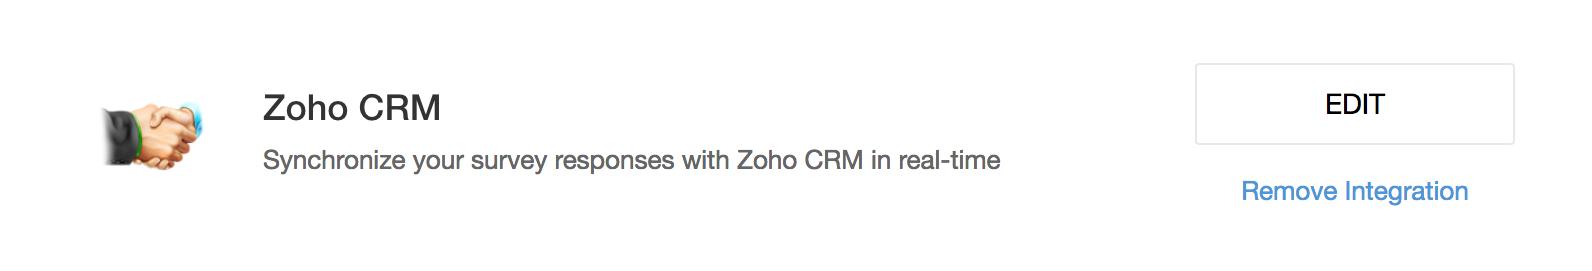 zoho-crm-remove-integration